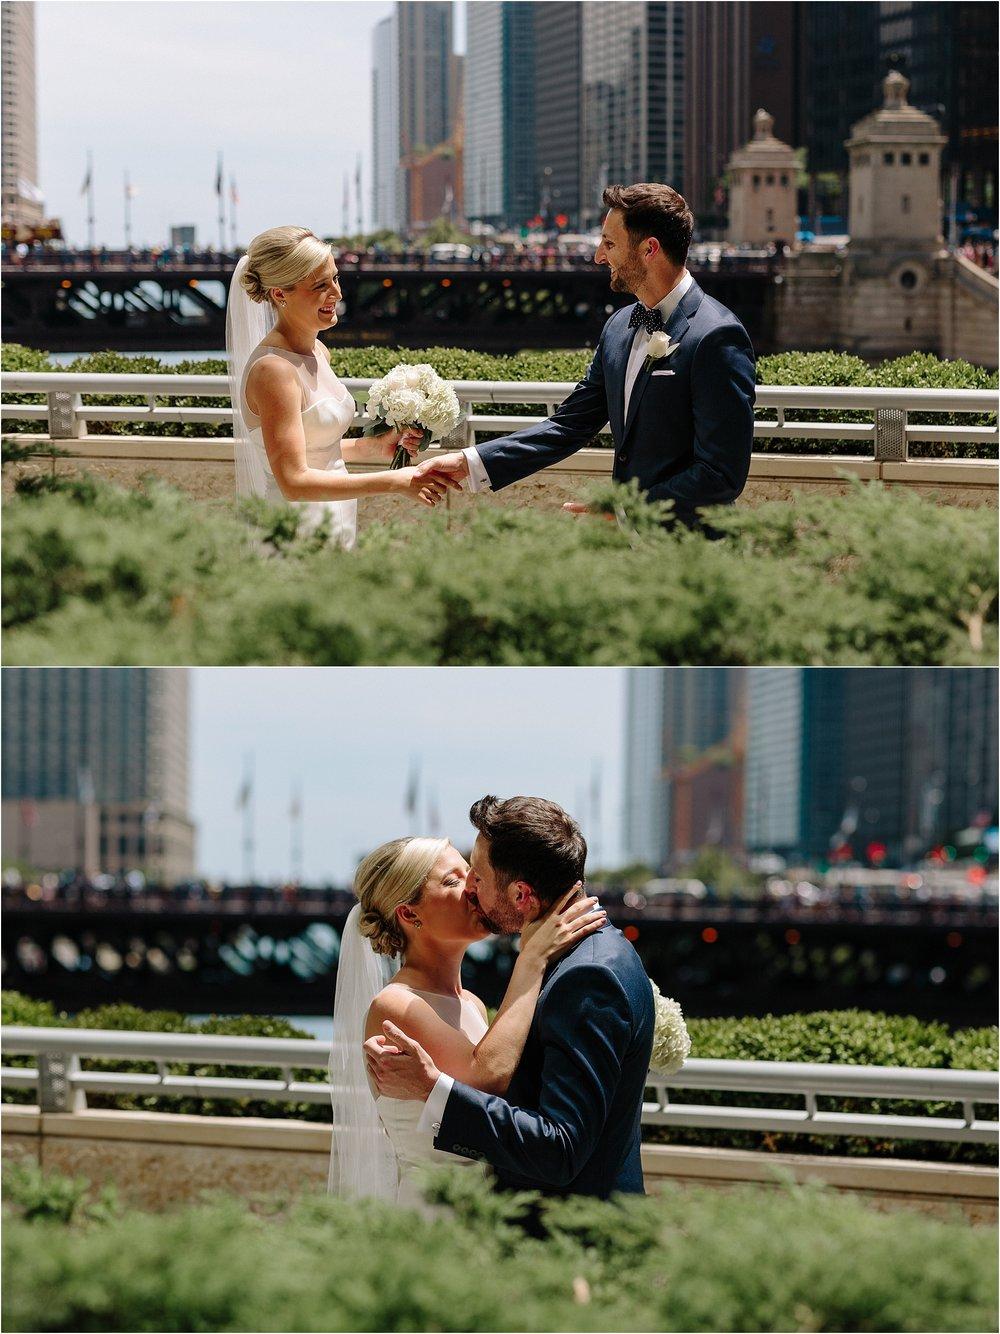 chicago-wedding-photographer-40.jpg